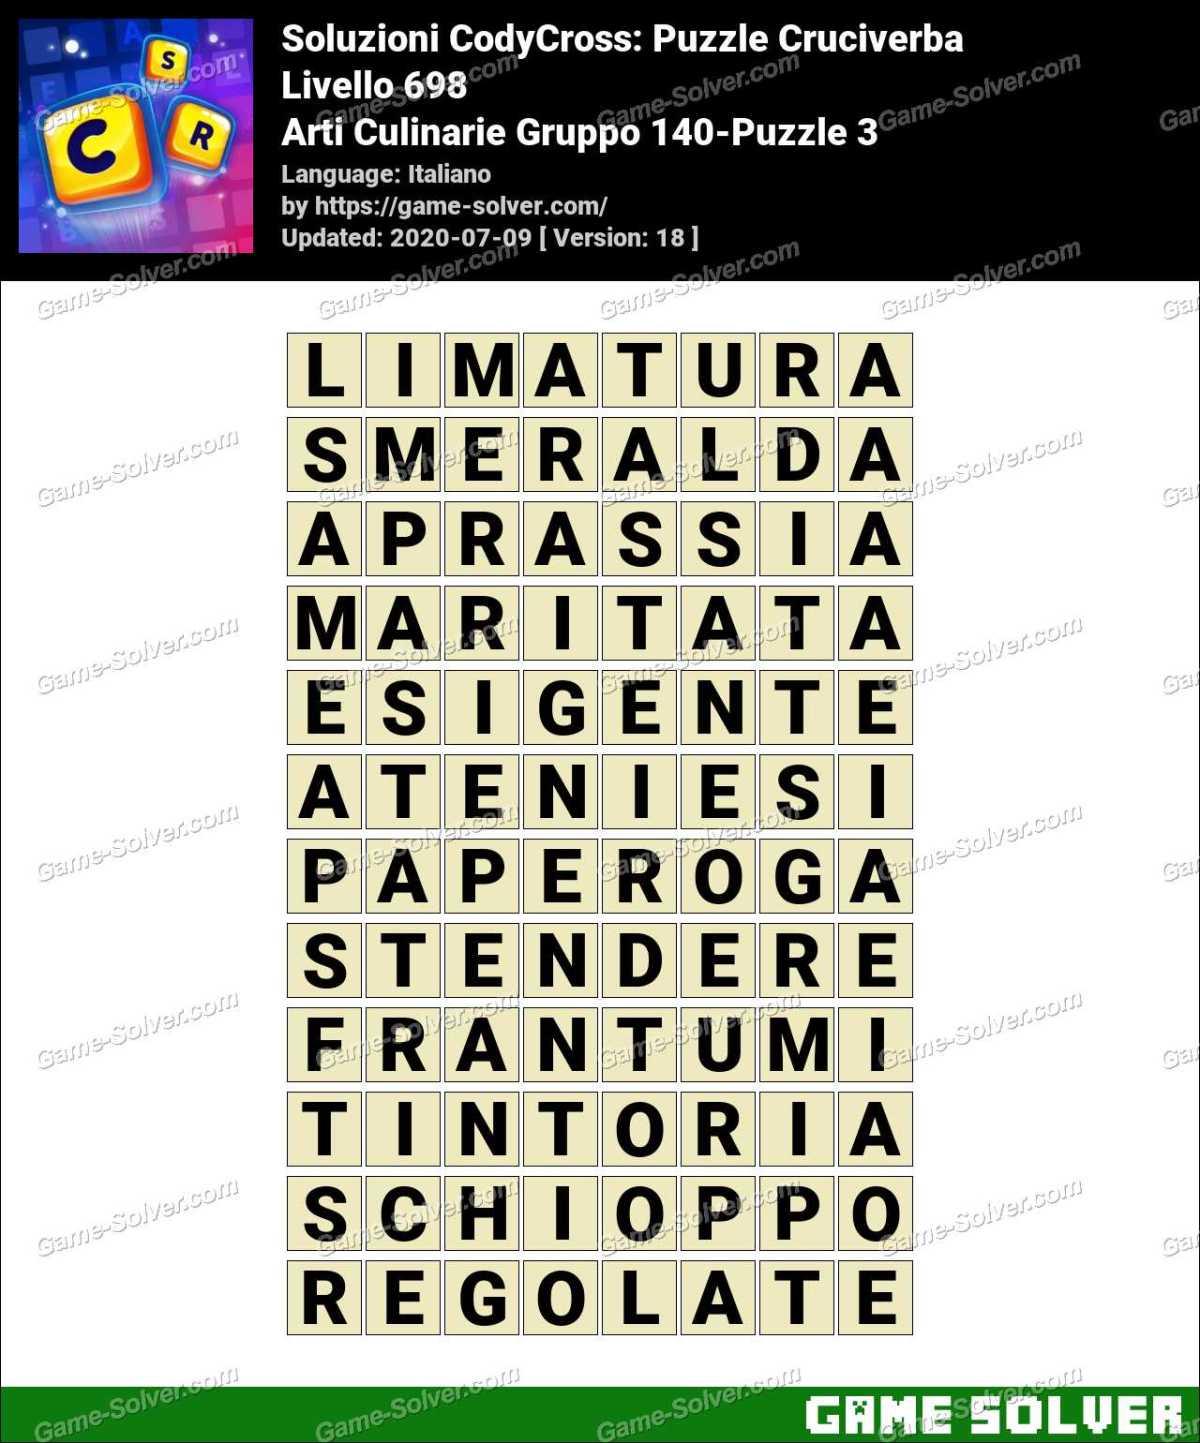 Soluzioni CodyCross Arti Culinarie Gruppo 140-Puzzle 3